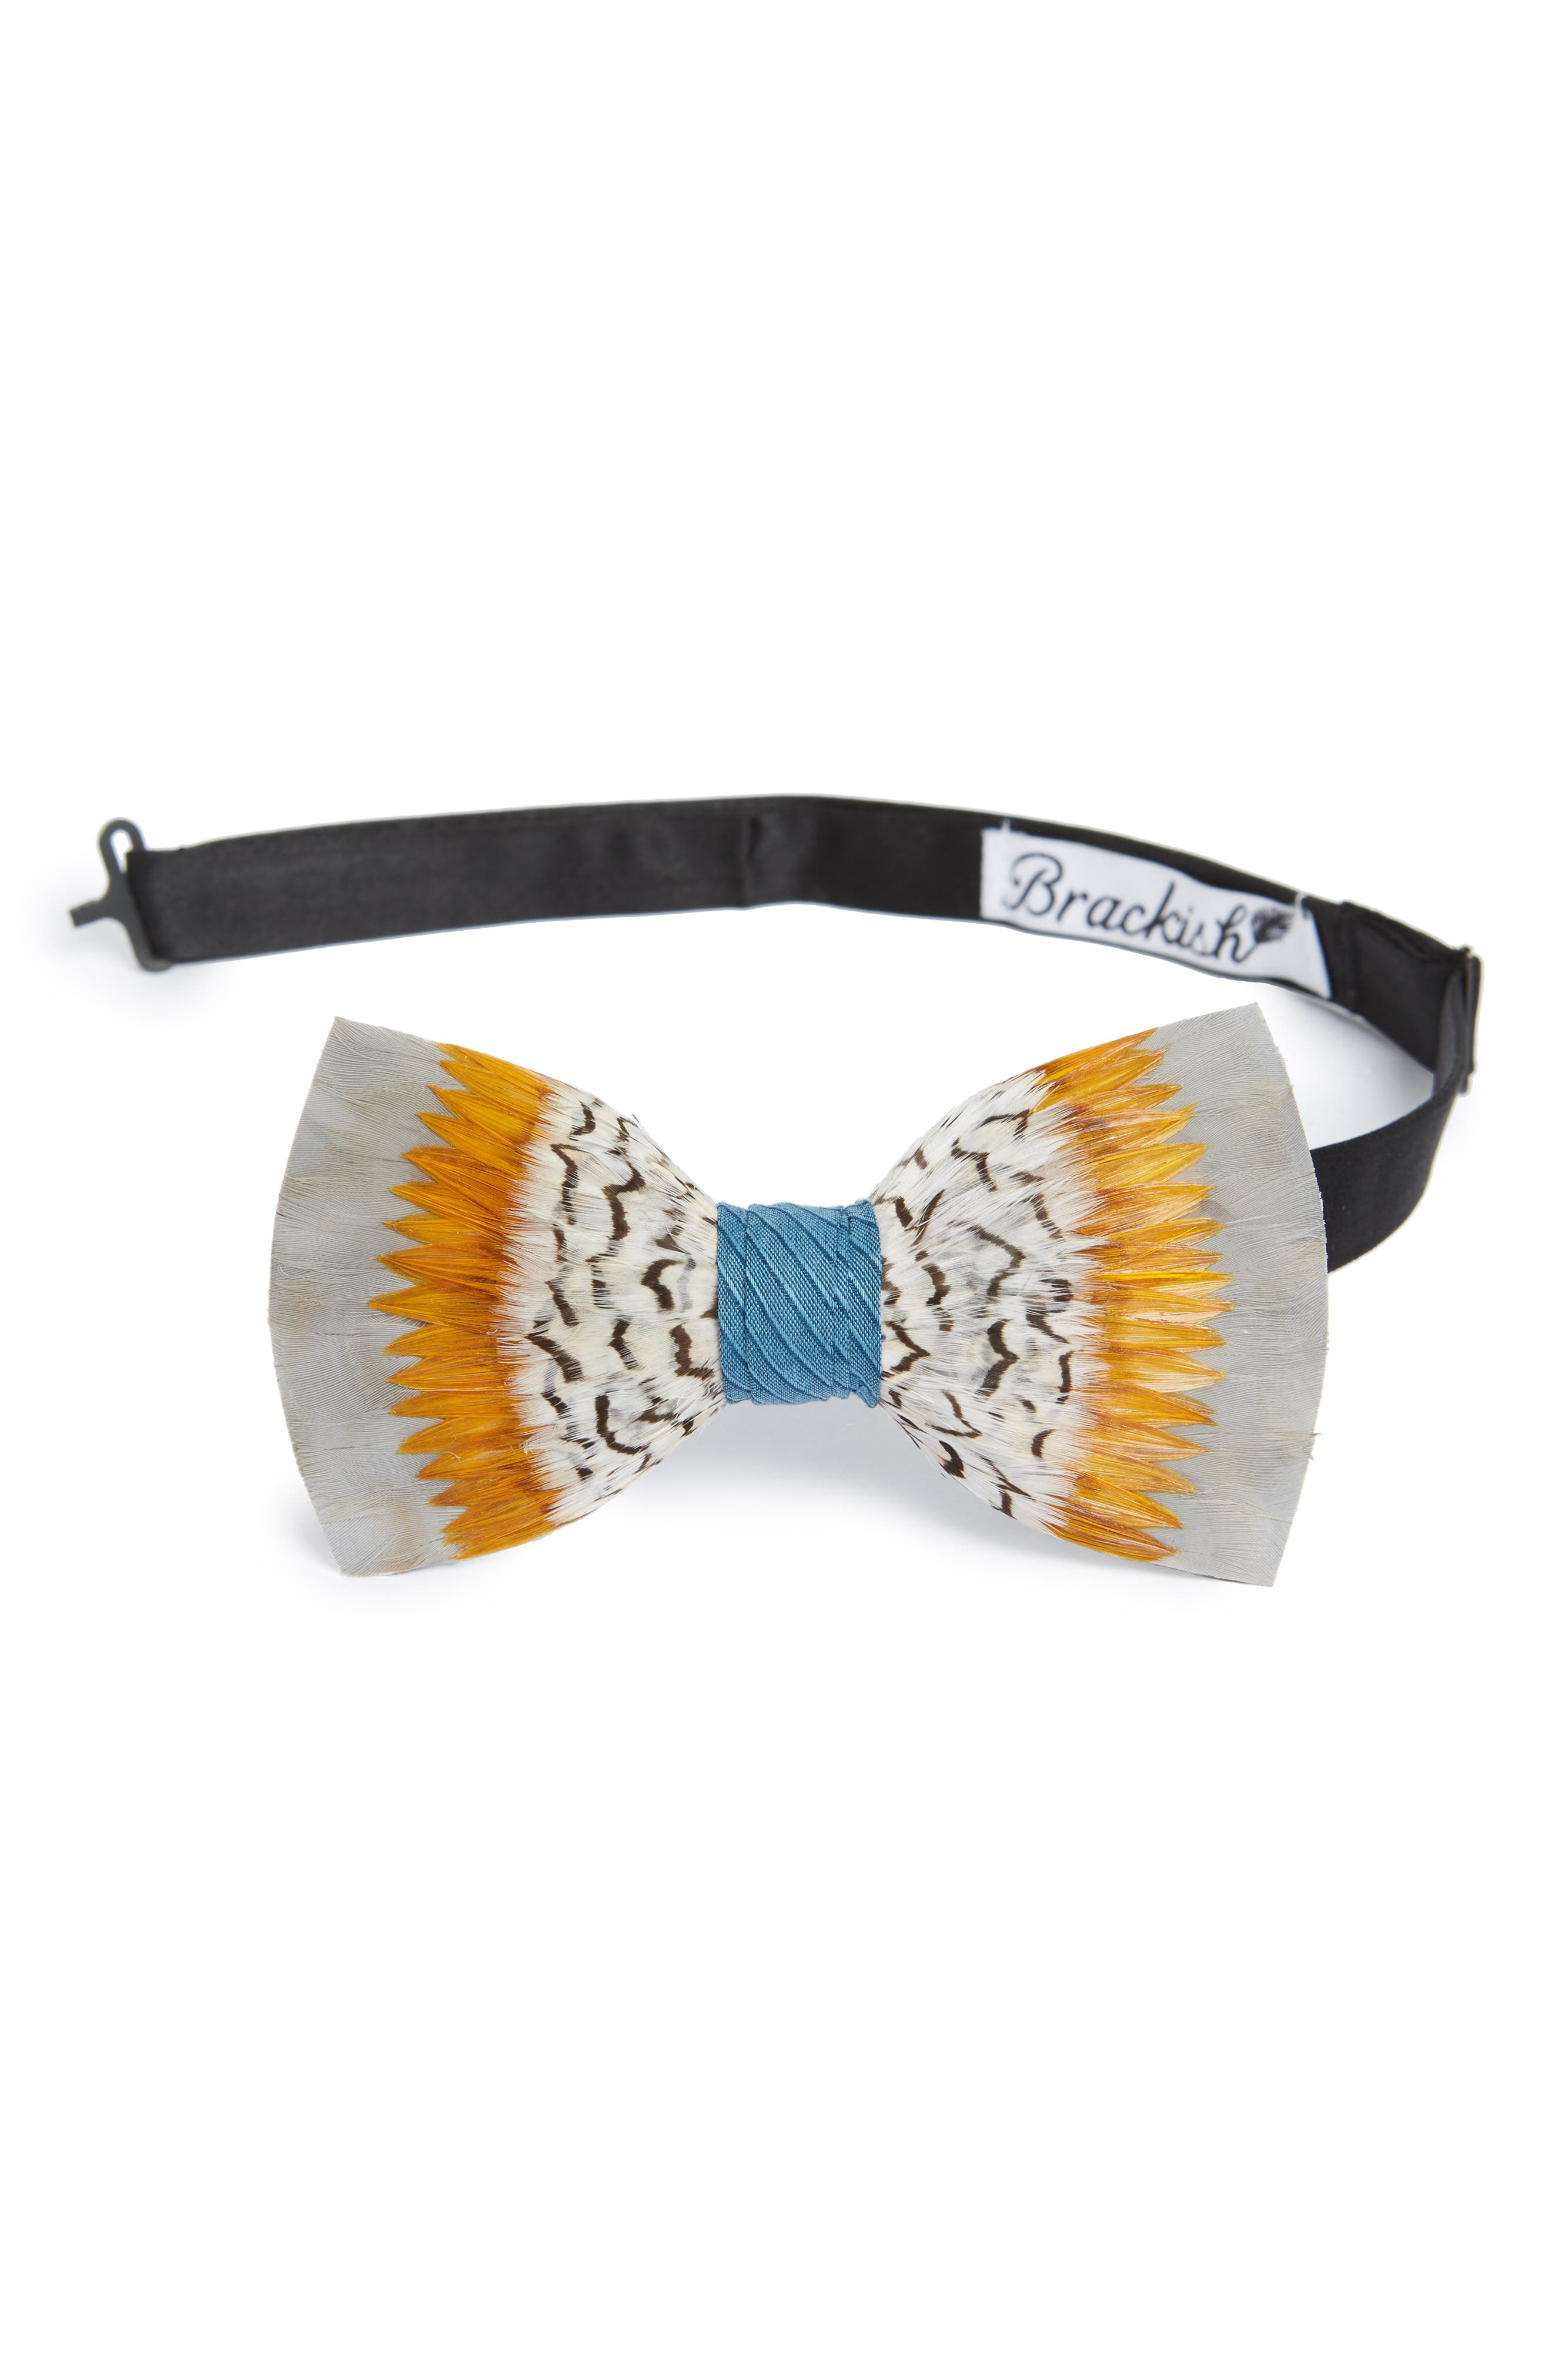 Stono Feather Bow Tie,                             Main thumbnail 1, color,                             YELLOW/ GREY